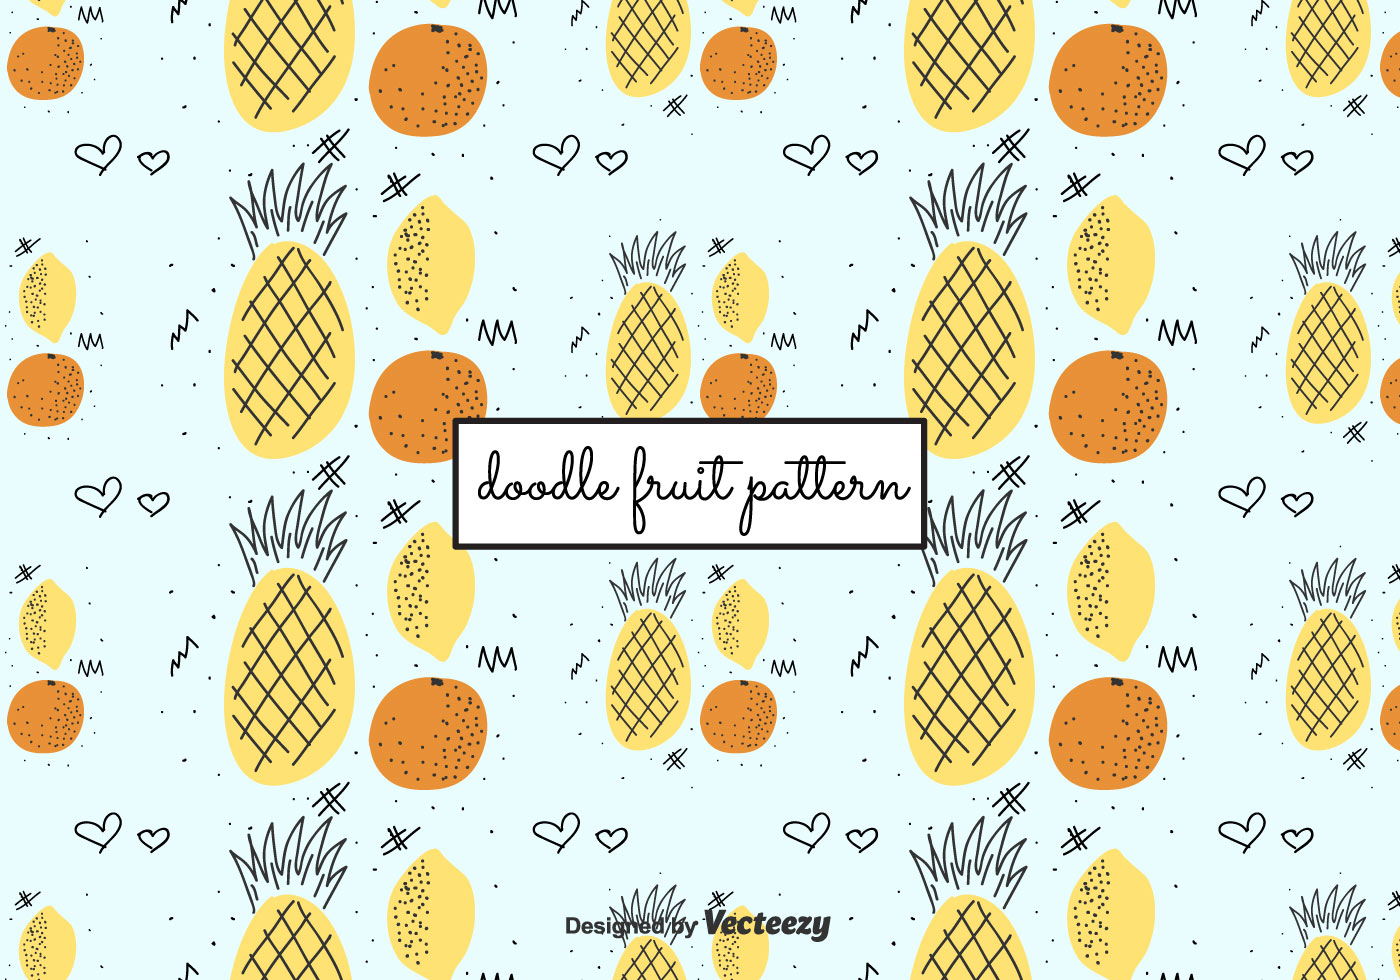 Wallpaper Strawberry Cute Doodle Fruit Pattern Download Free Vectors Clipart